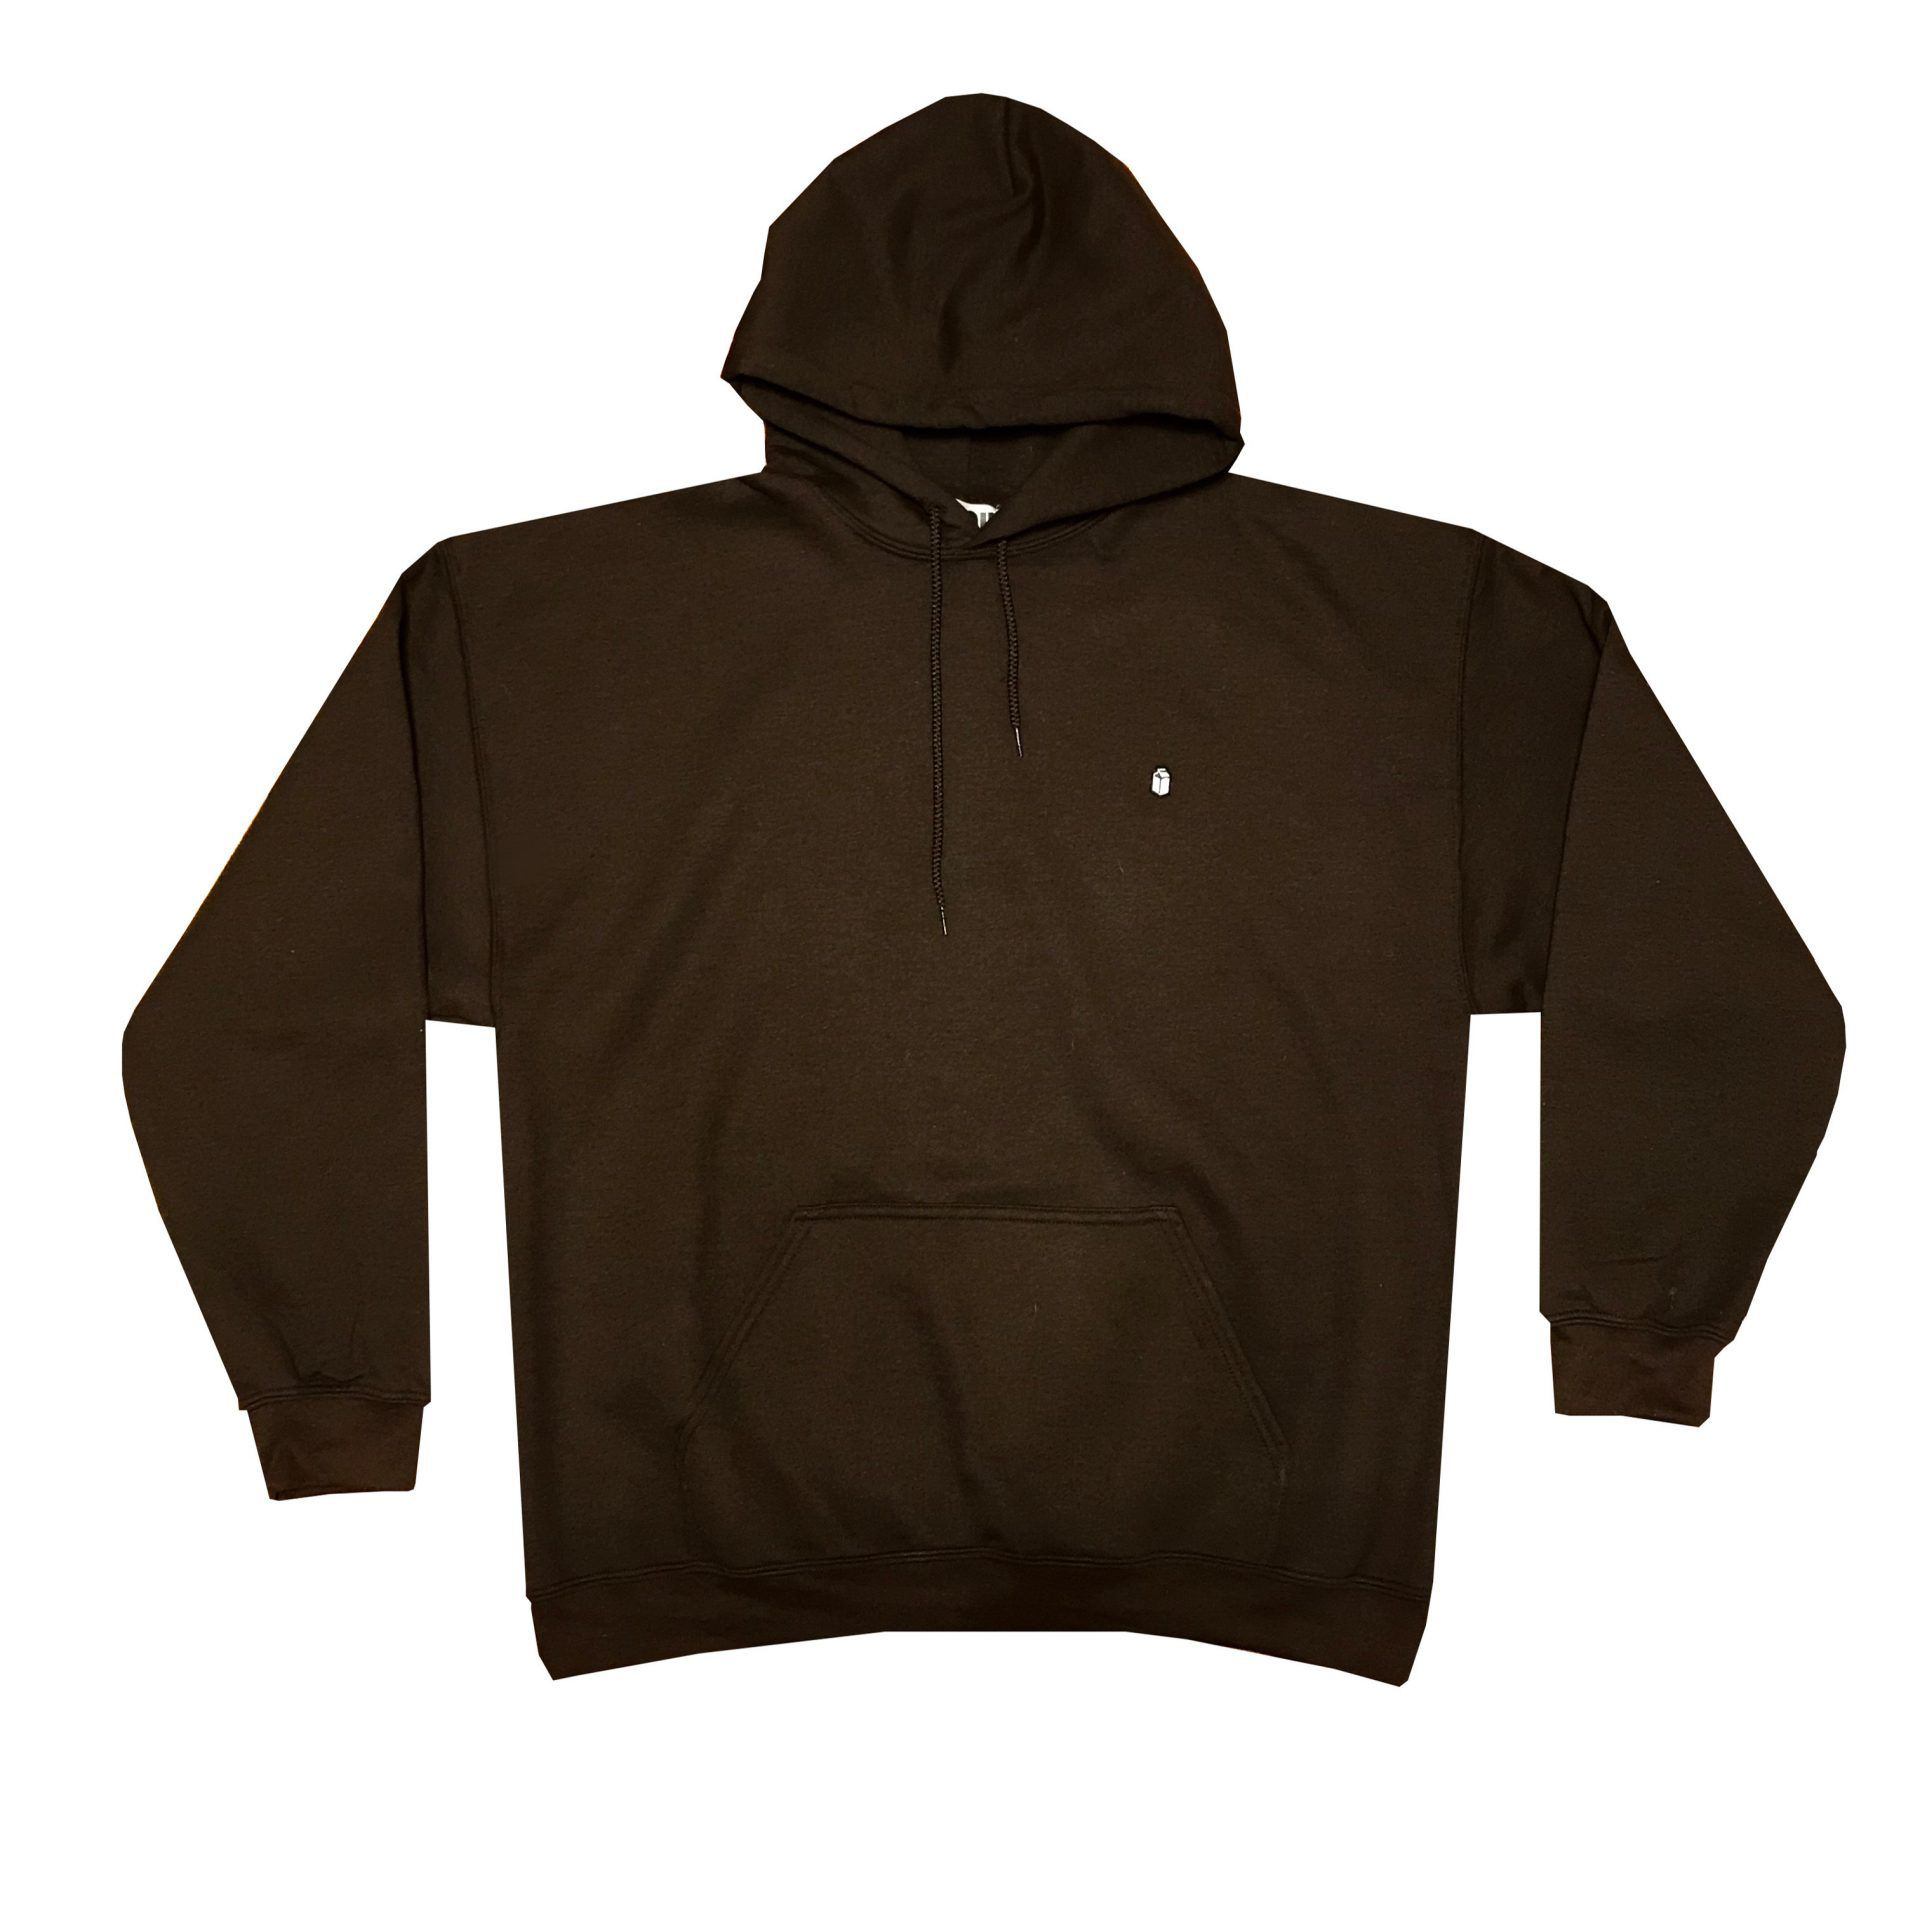 SoYou Clothing Basics Hoodie in Dark Chocolate